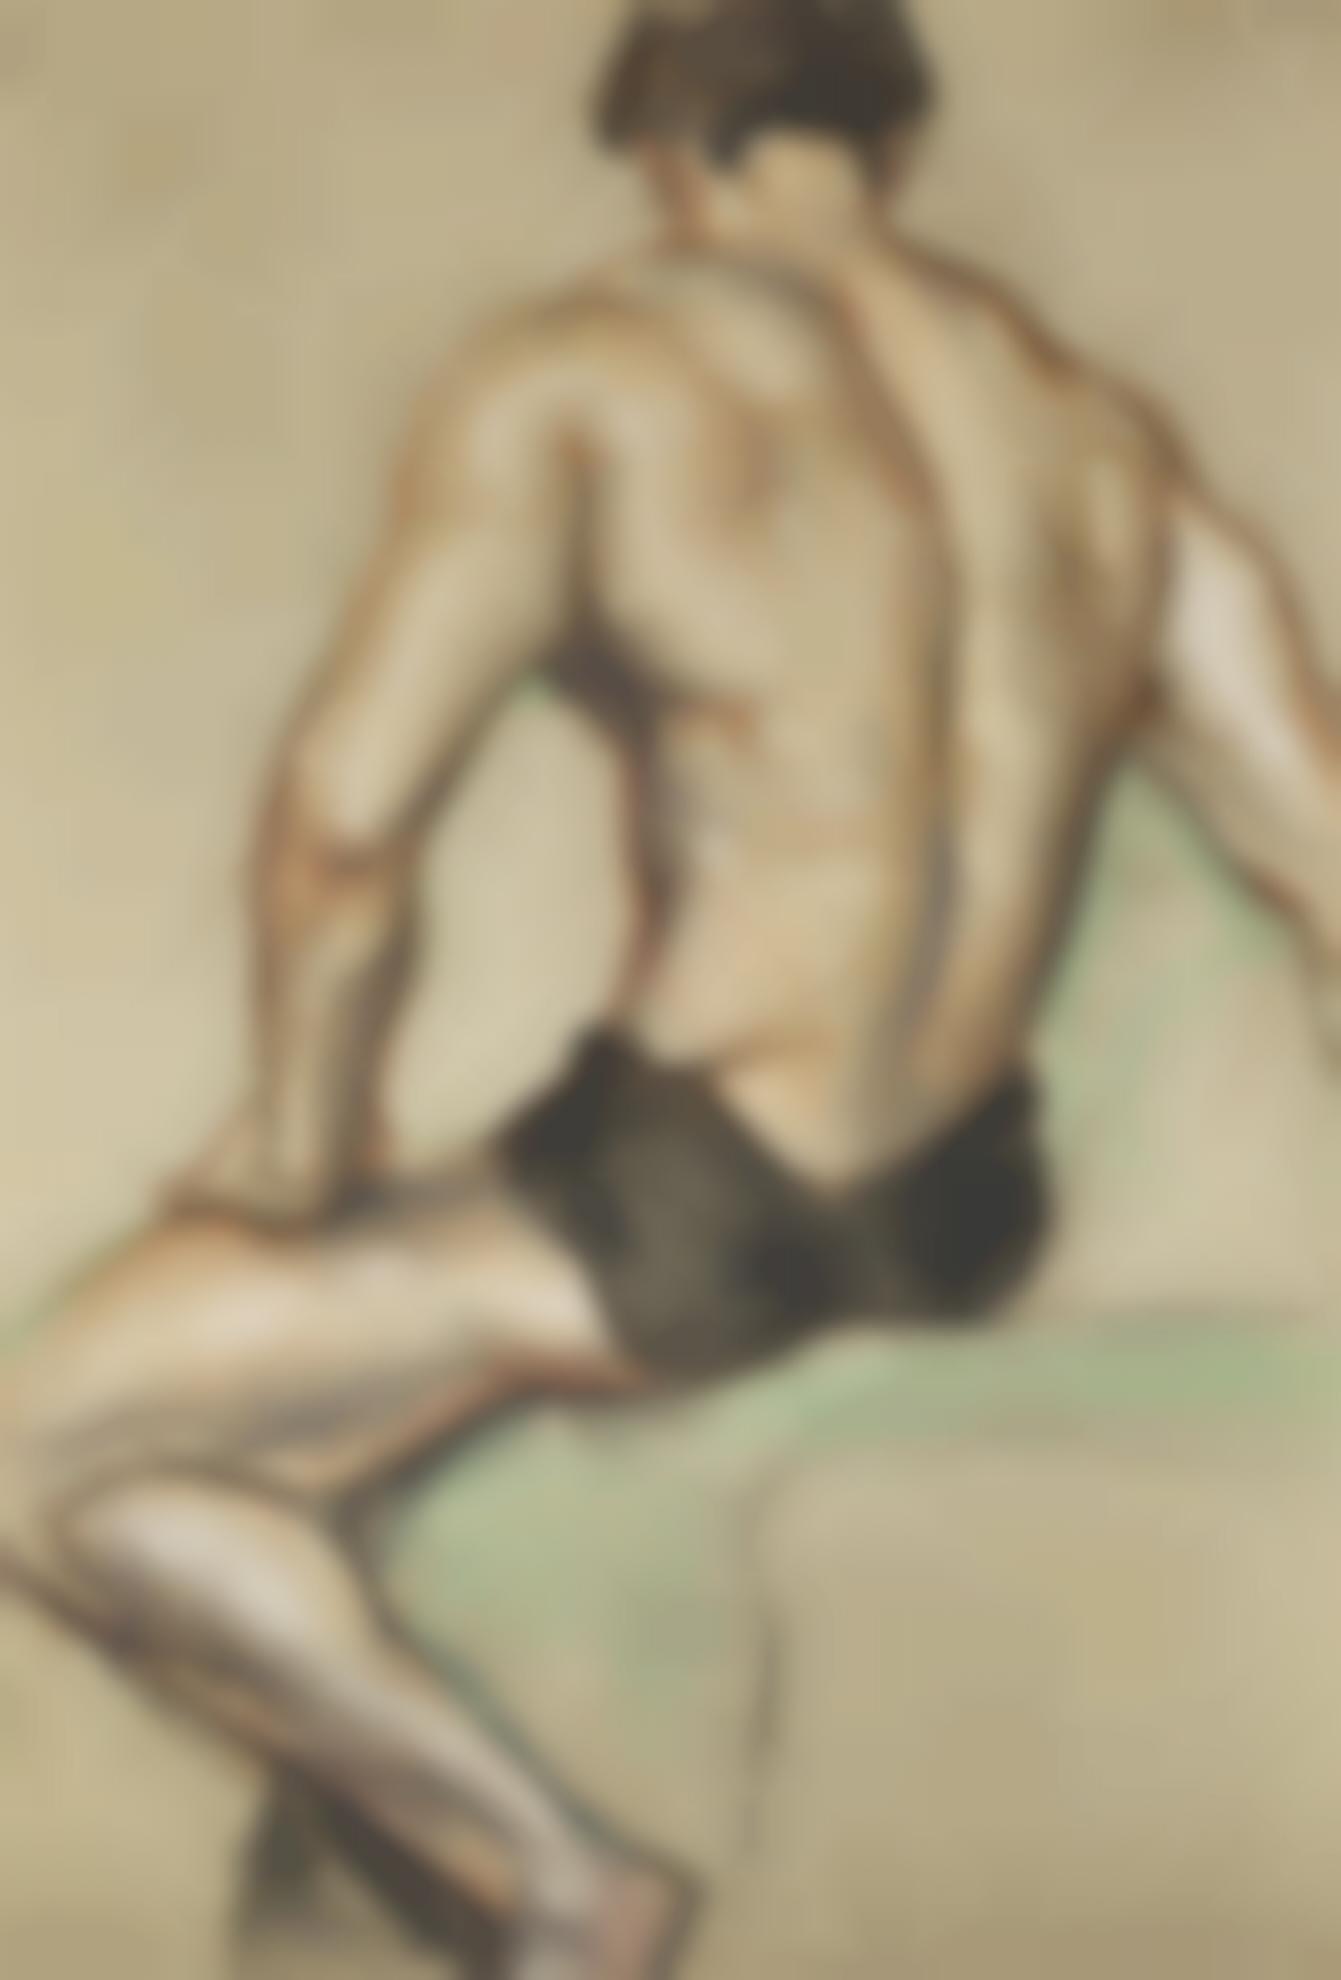 Austin Osman Spare-Life Study-1950